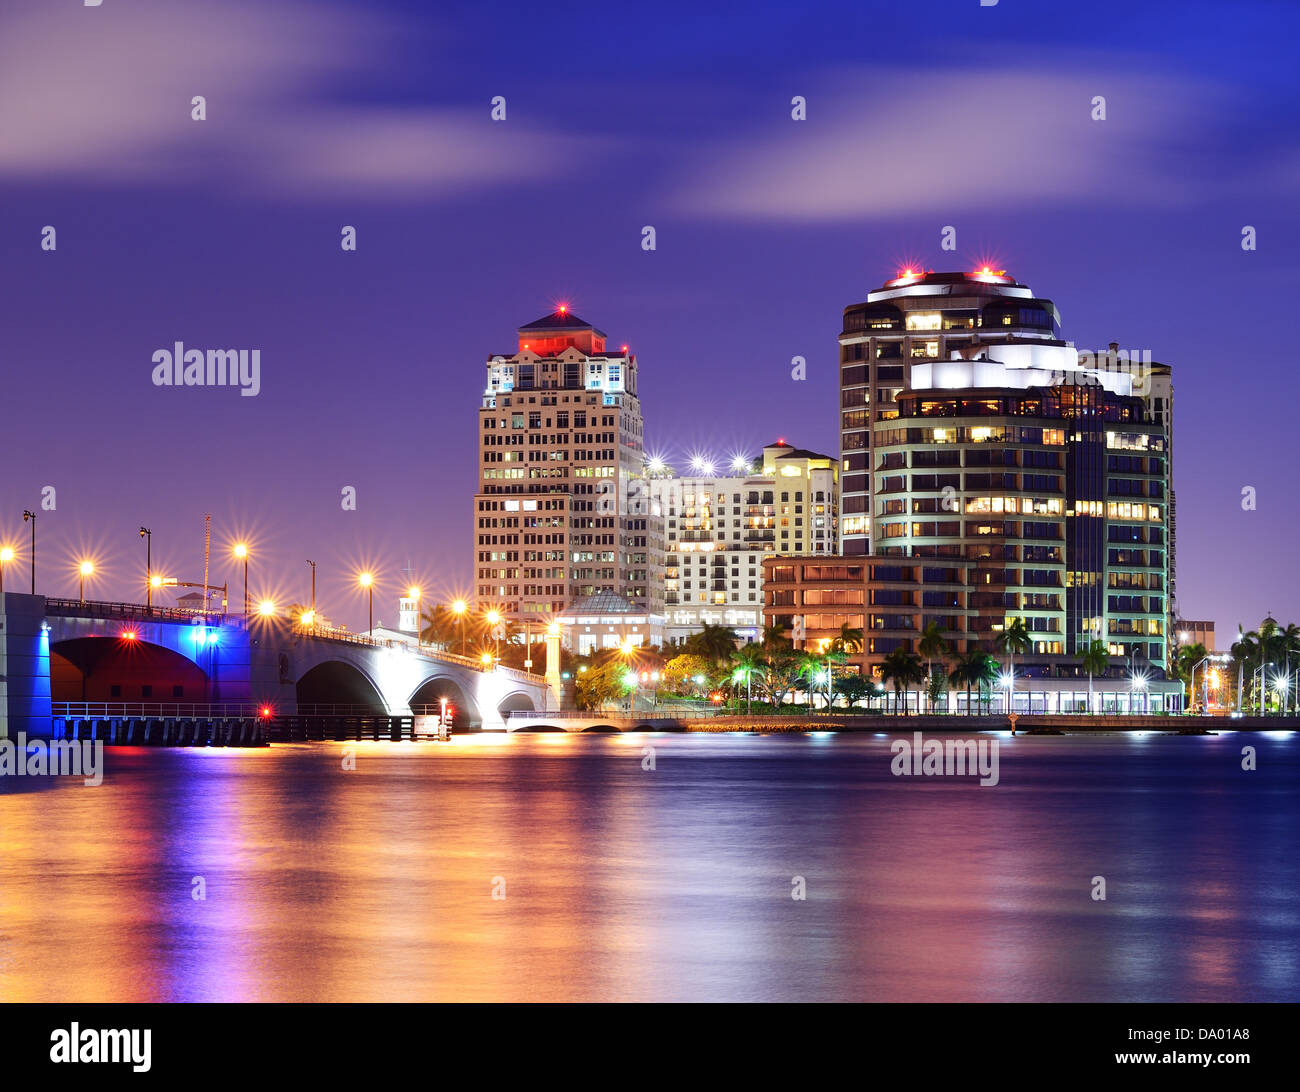 Skyline of West Palm Beach, Florida, USA. - Stock Image